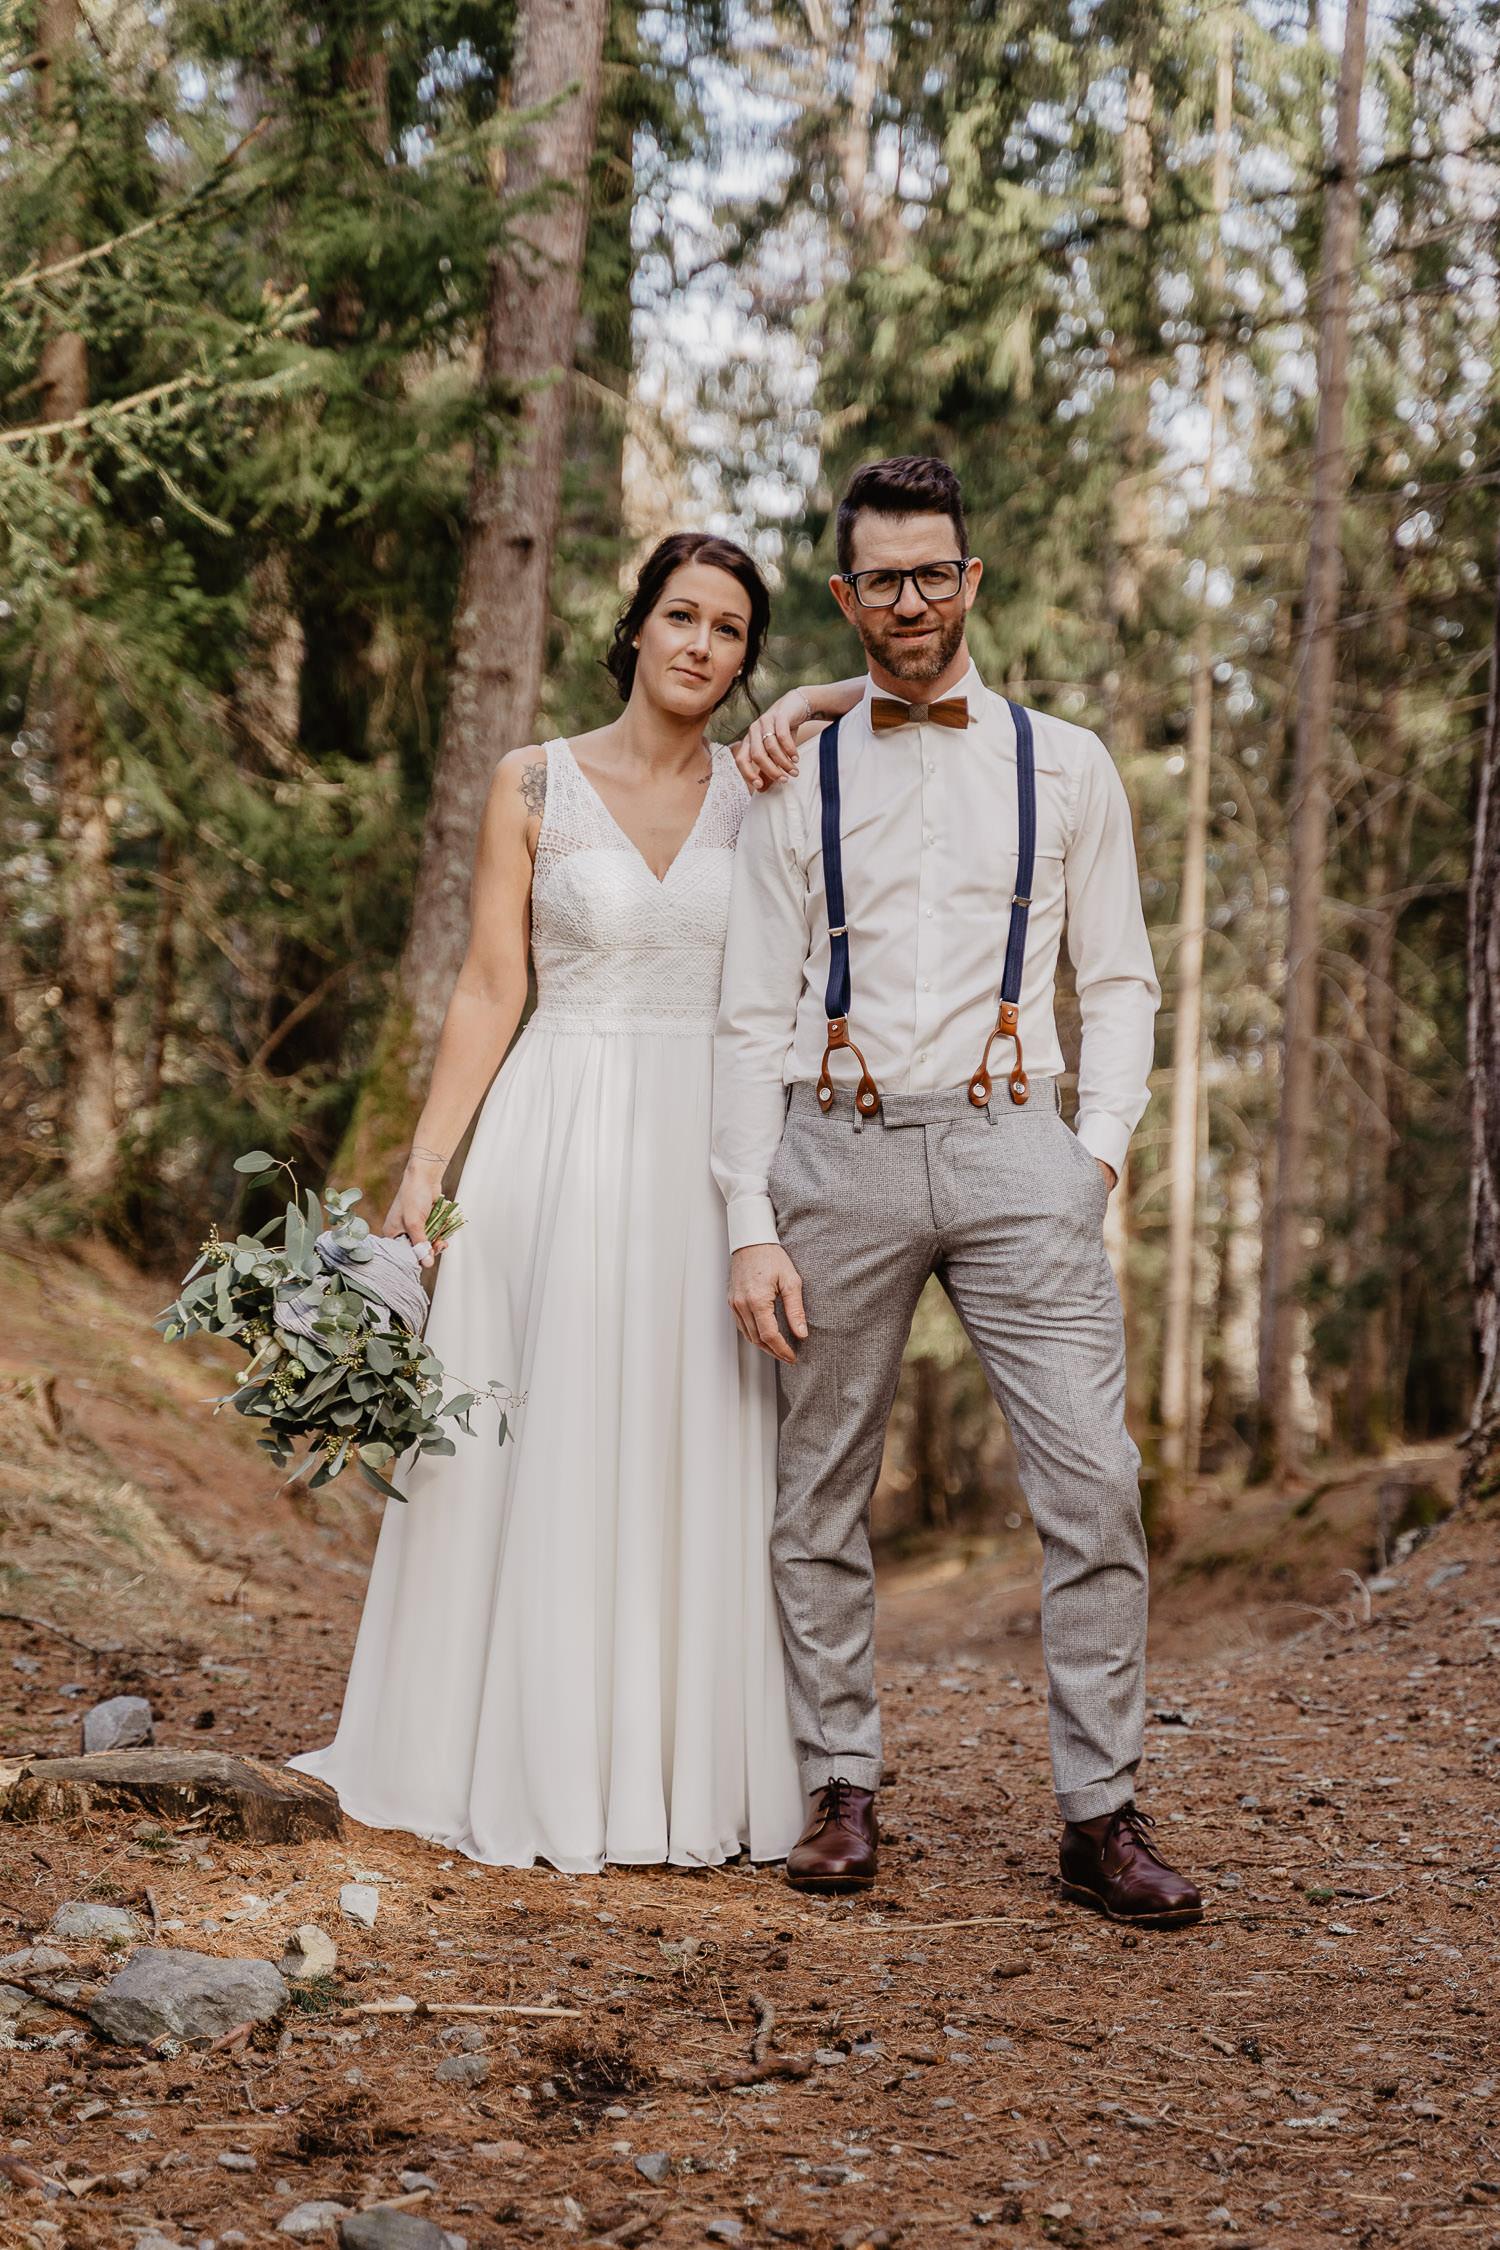 Hochzeitsfotograf Axams Patscherkofel 16